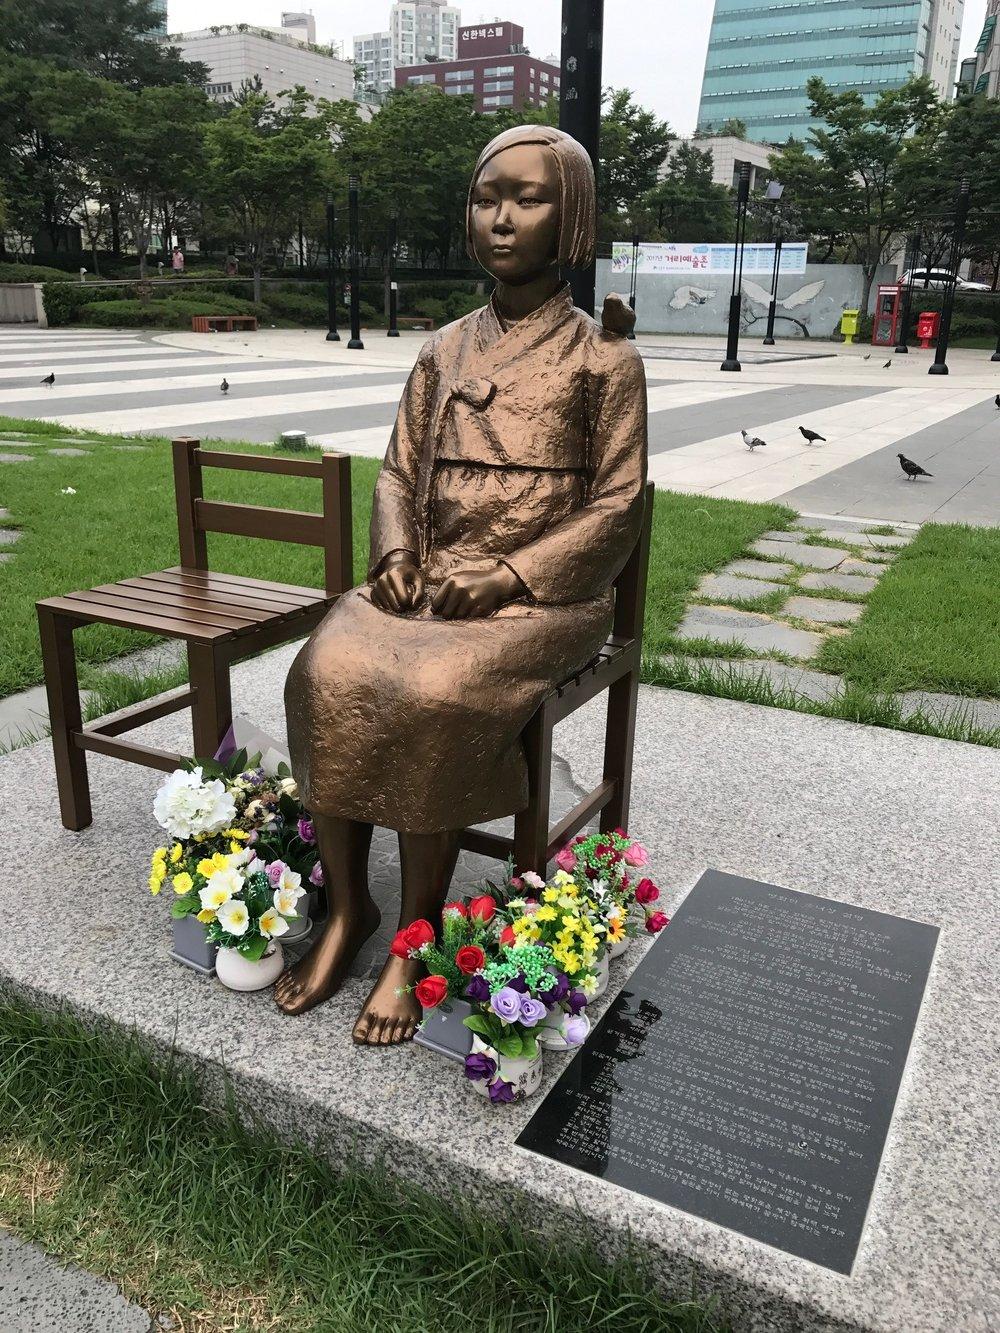 'Comfort Women' Statue - Wangsimni Staion, Seoul, South Korea